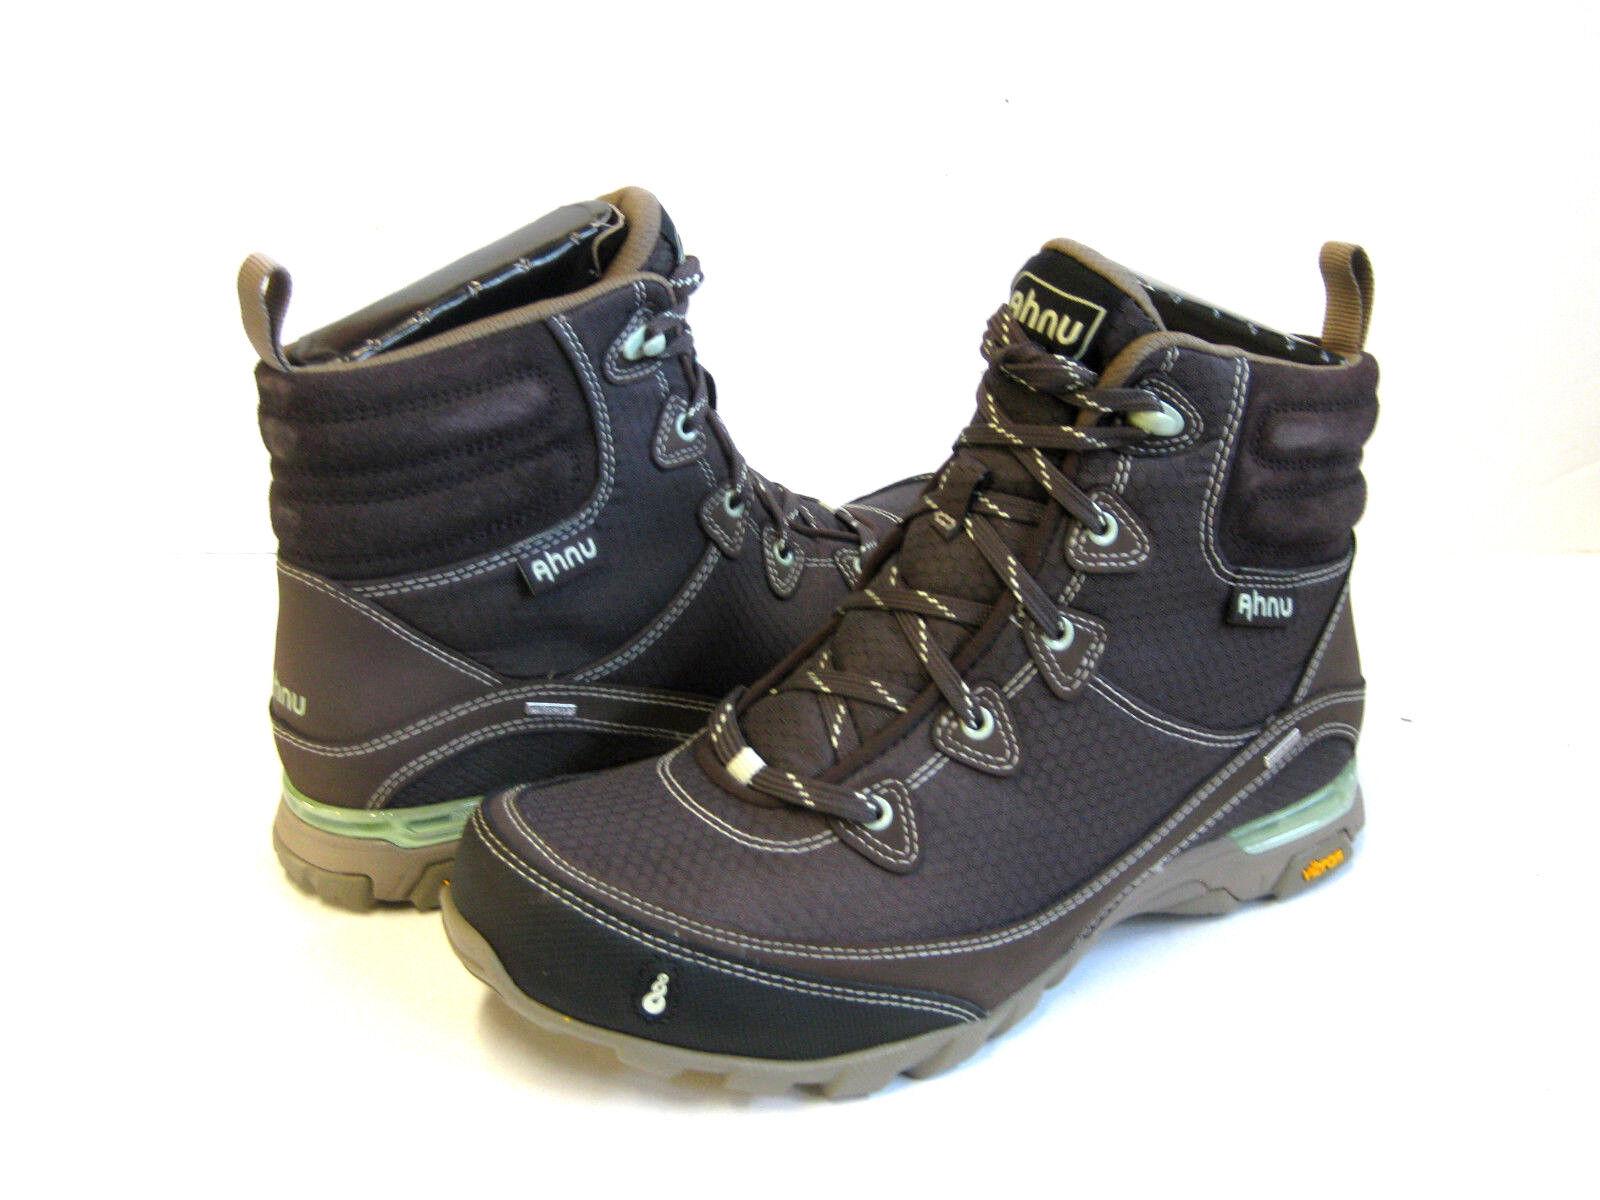 AHNU SUGARPINE WOMEN HIKING BOOTS WATERPROOF MULCH US 5.5    UK 3.5  EU36.5  JP255 089977